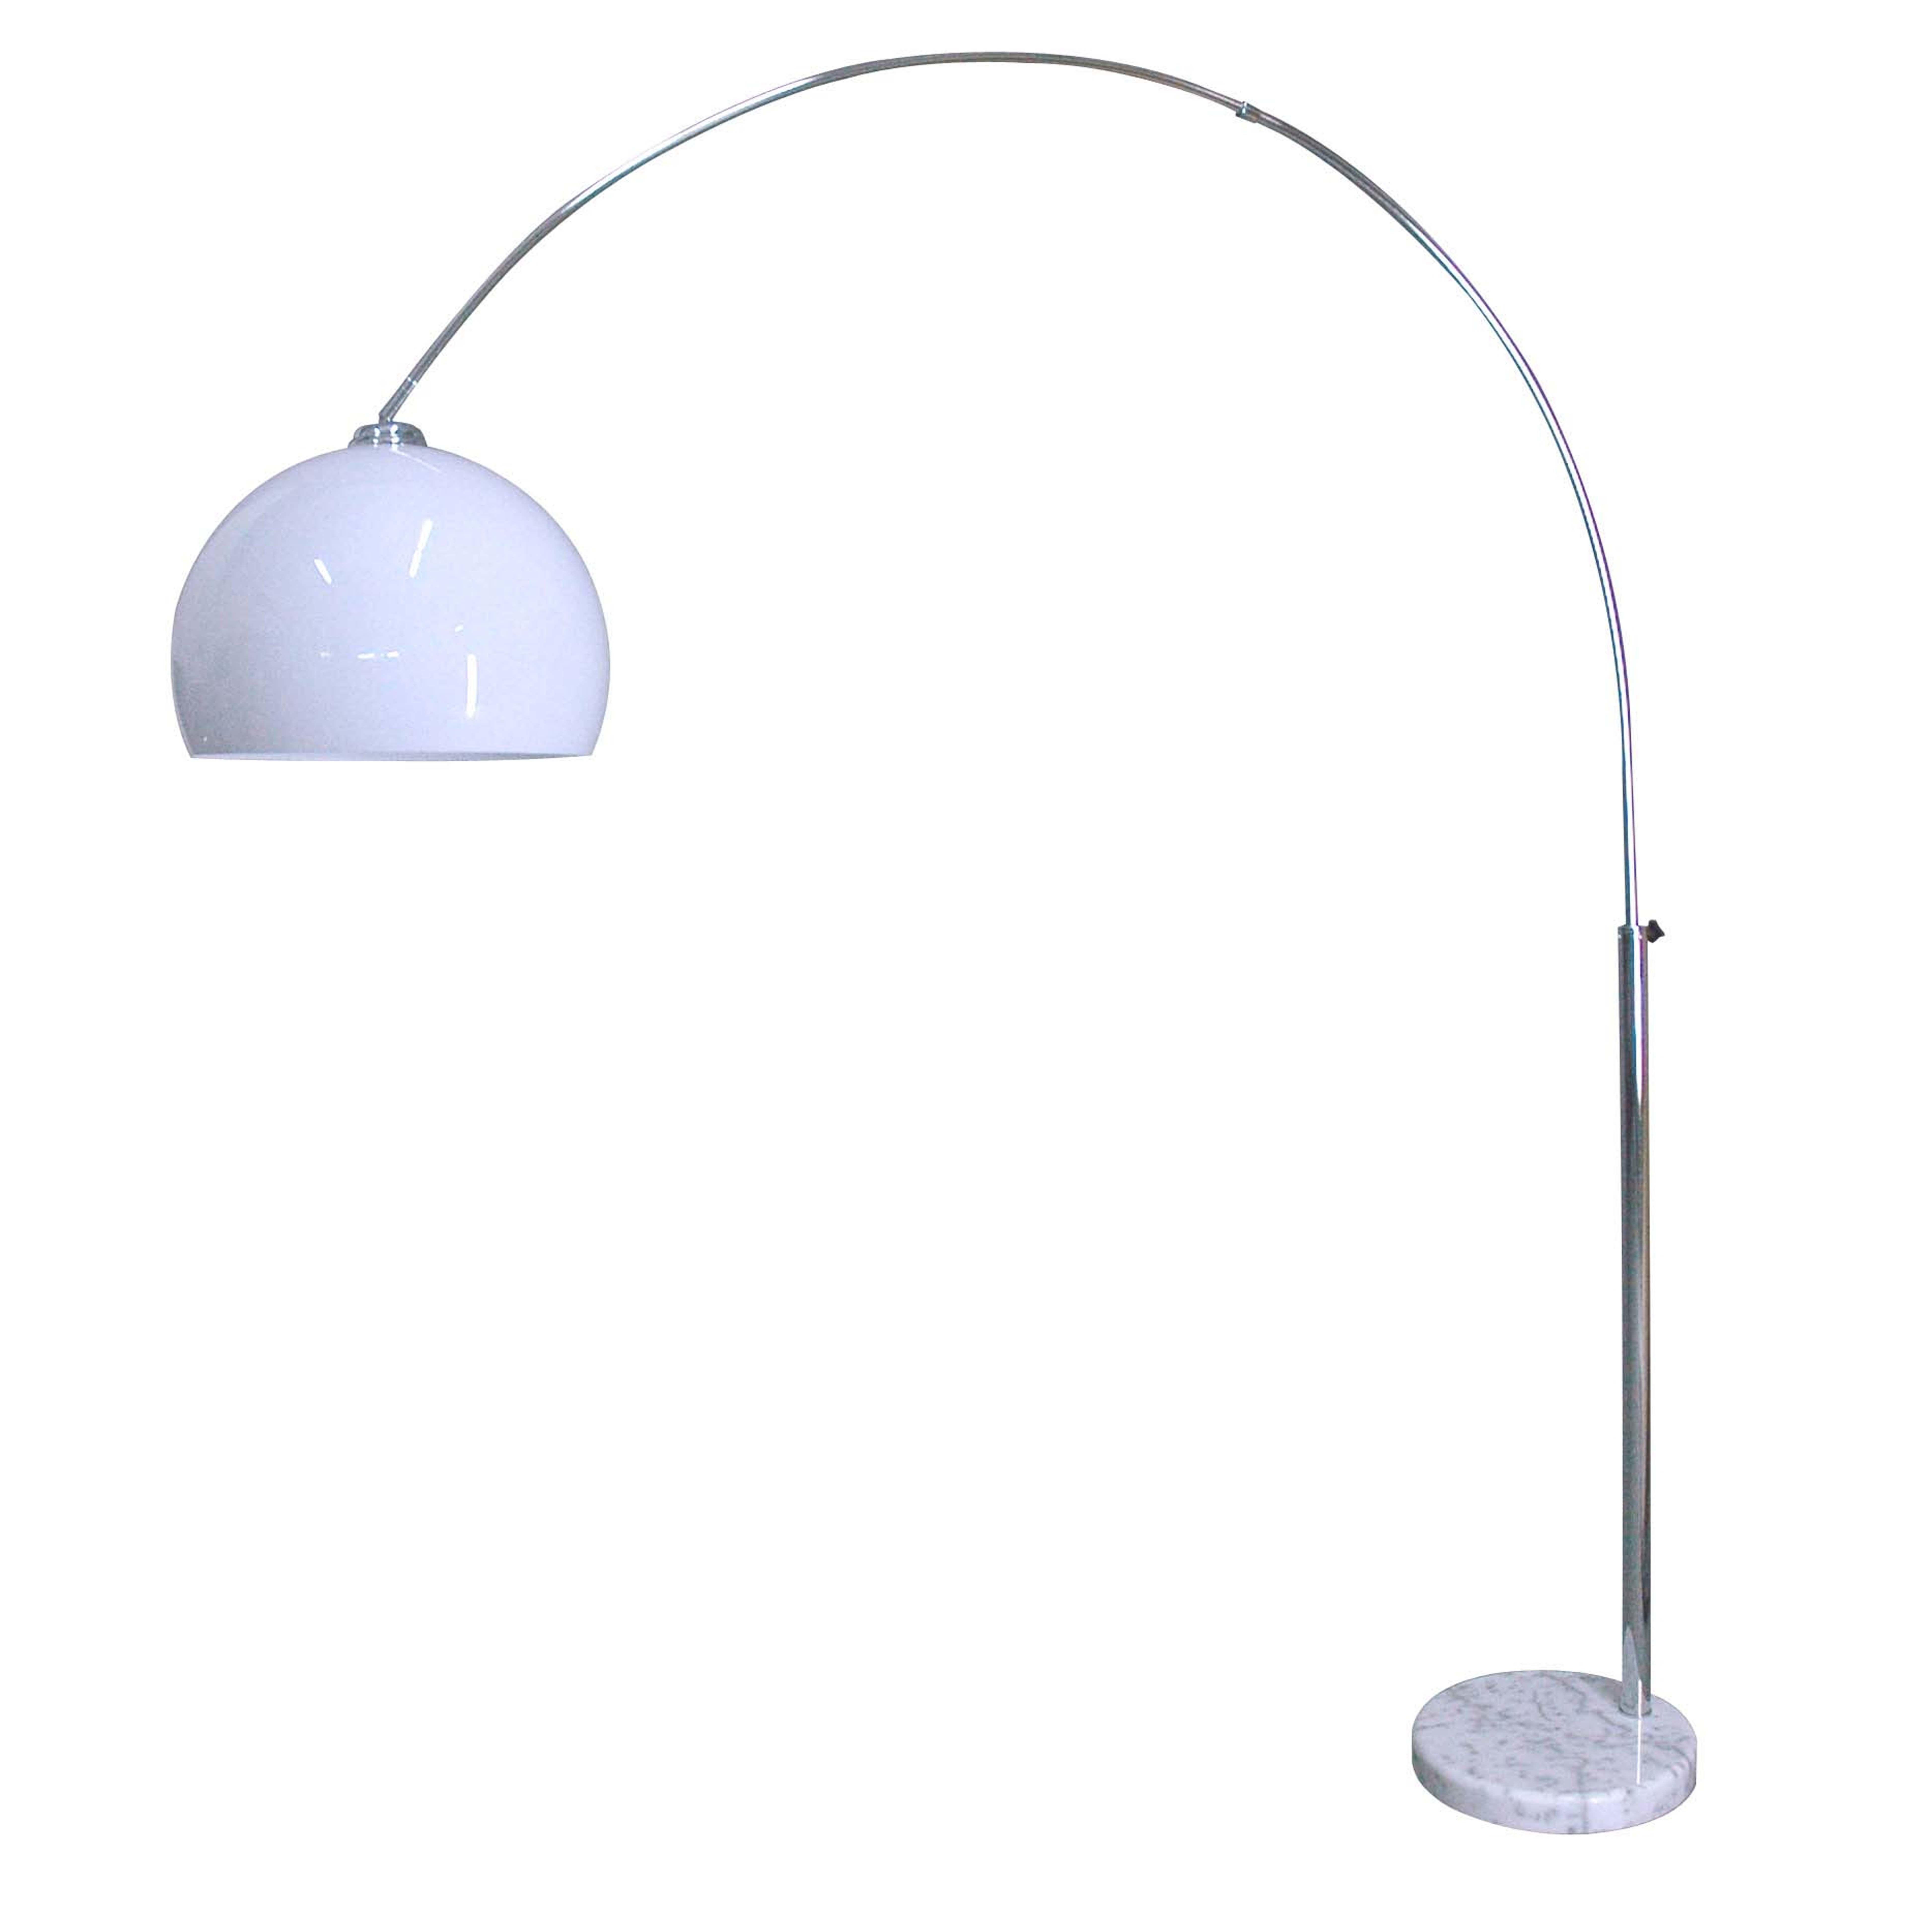 Lampy agata meble